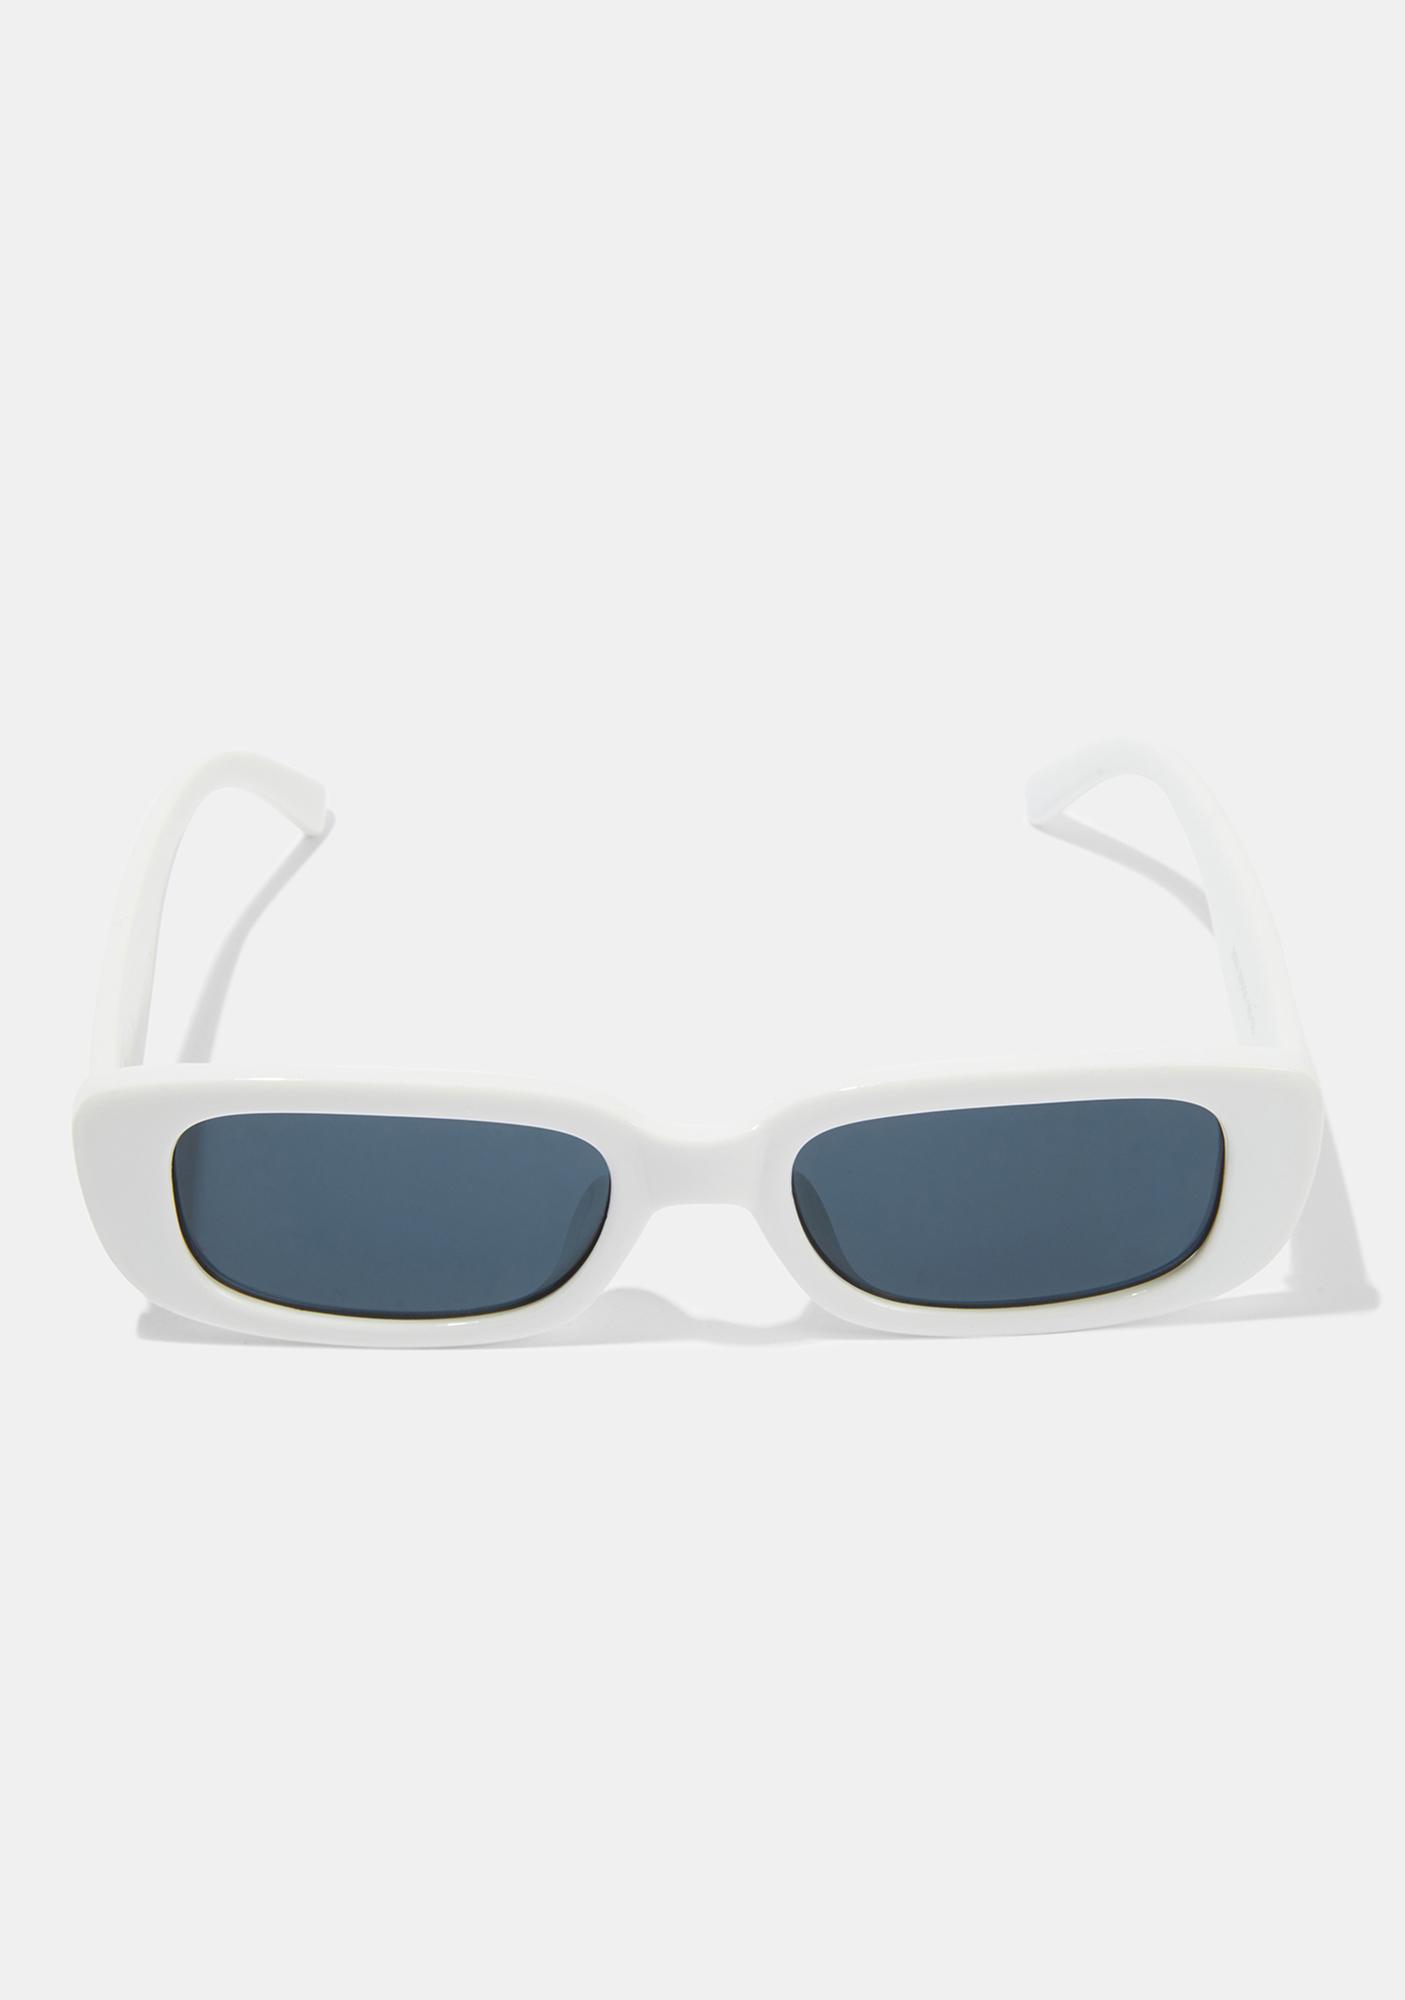 Pure See The Truth Square Sunglasses